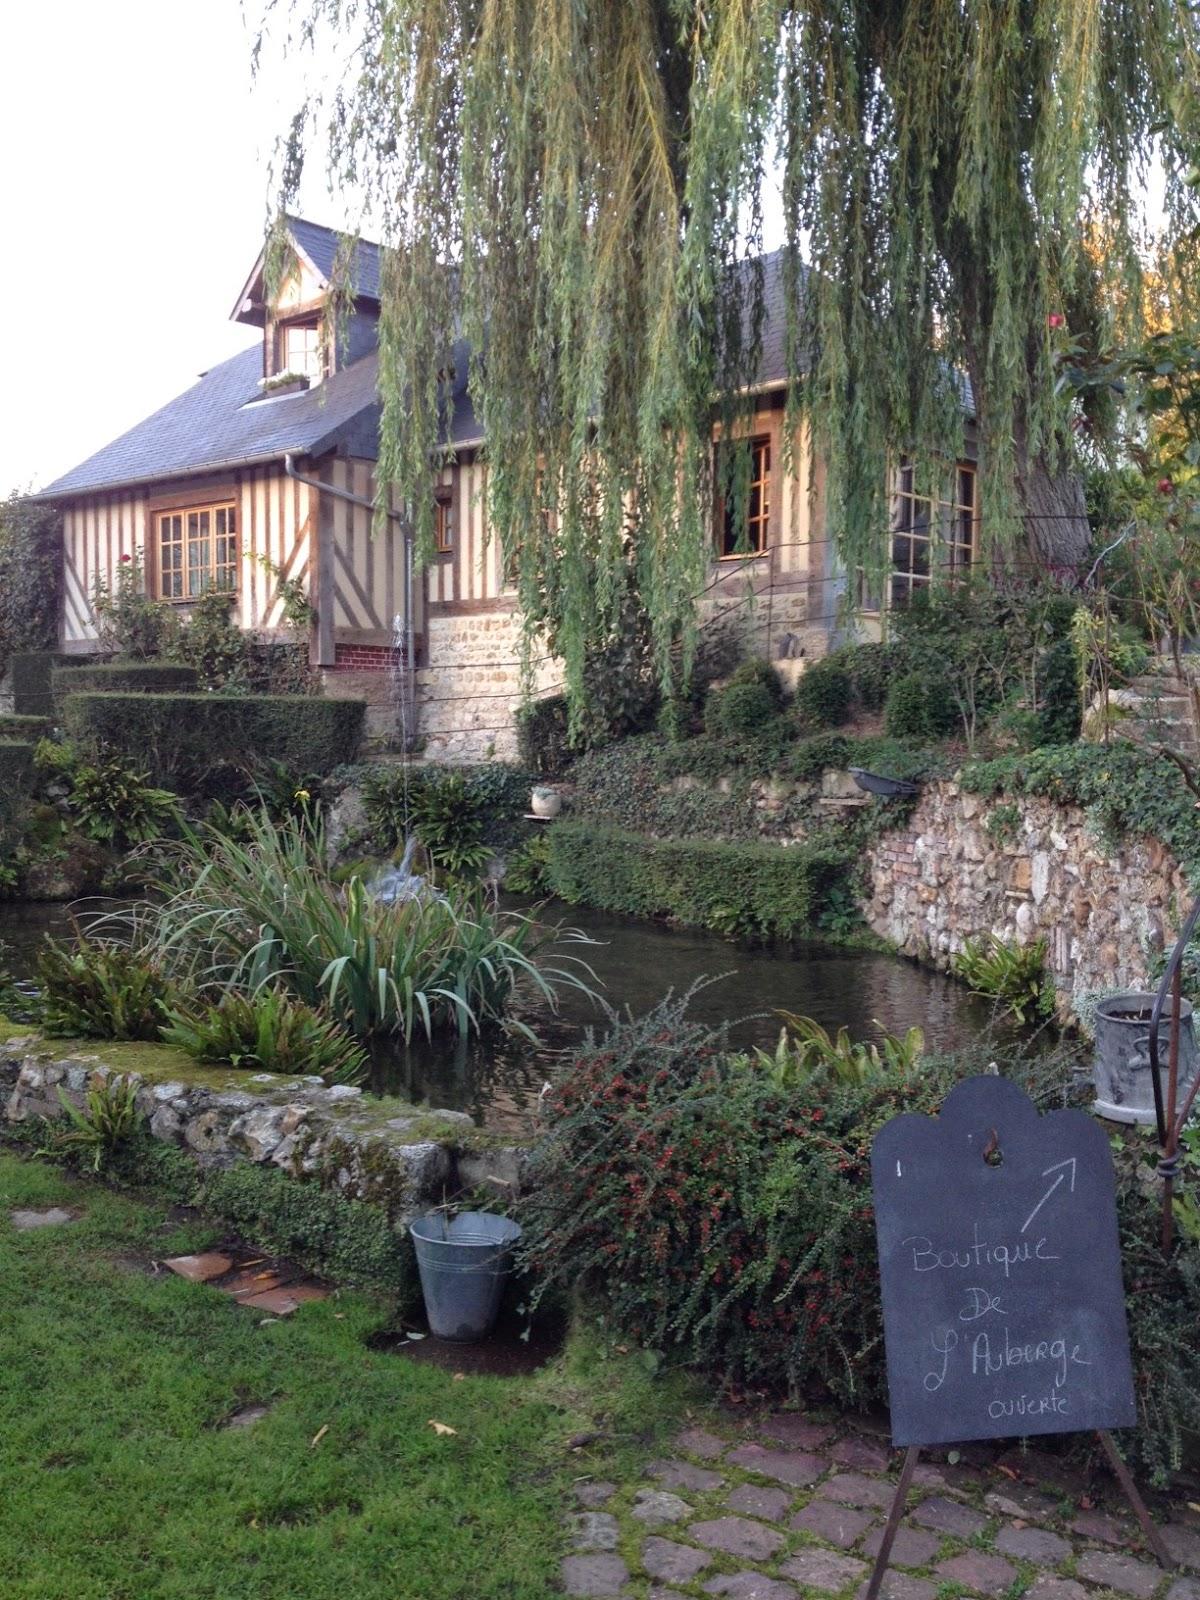 L'Auberge de La Source - Barneville - Normandie